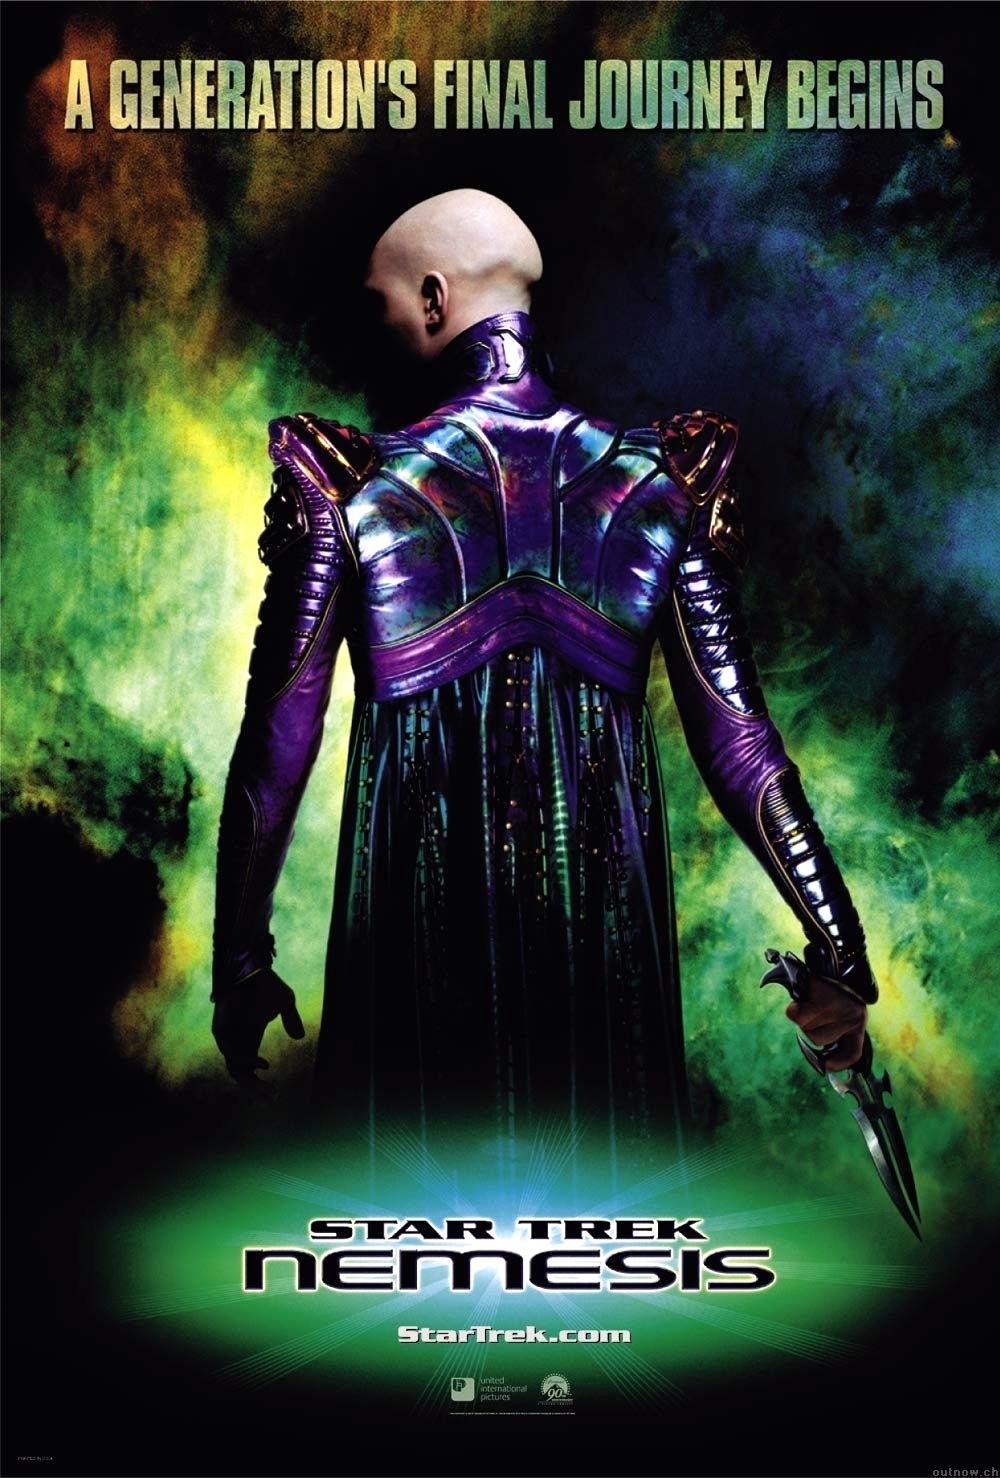 Movie Posters Star Trek Star Trek x Nemesis Poster